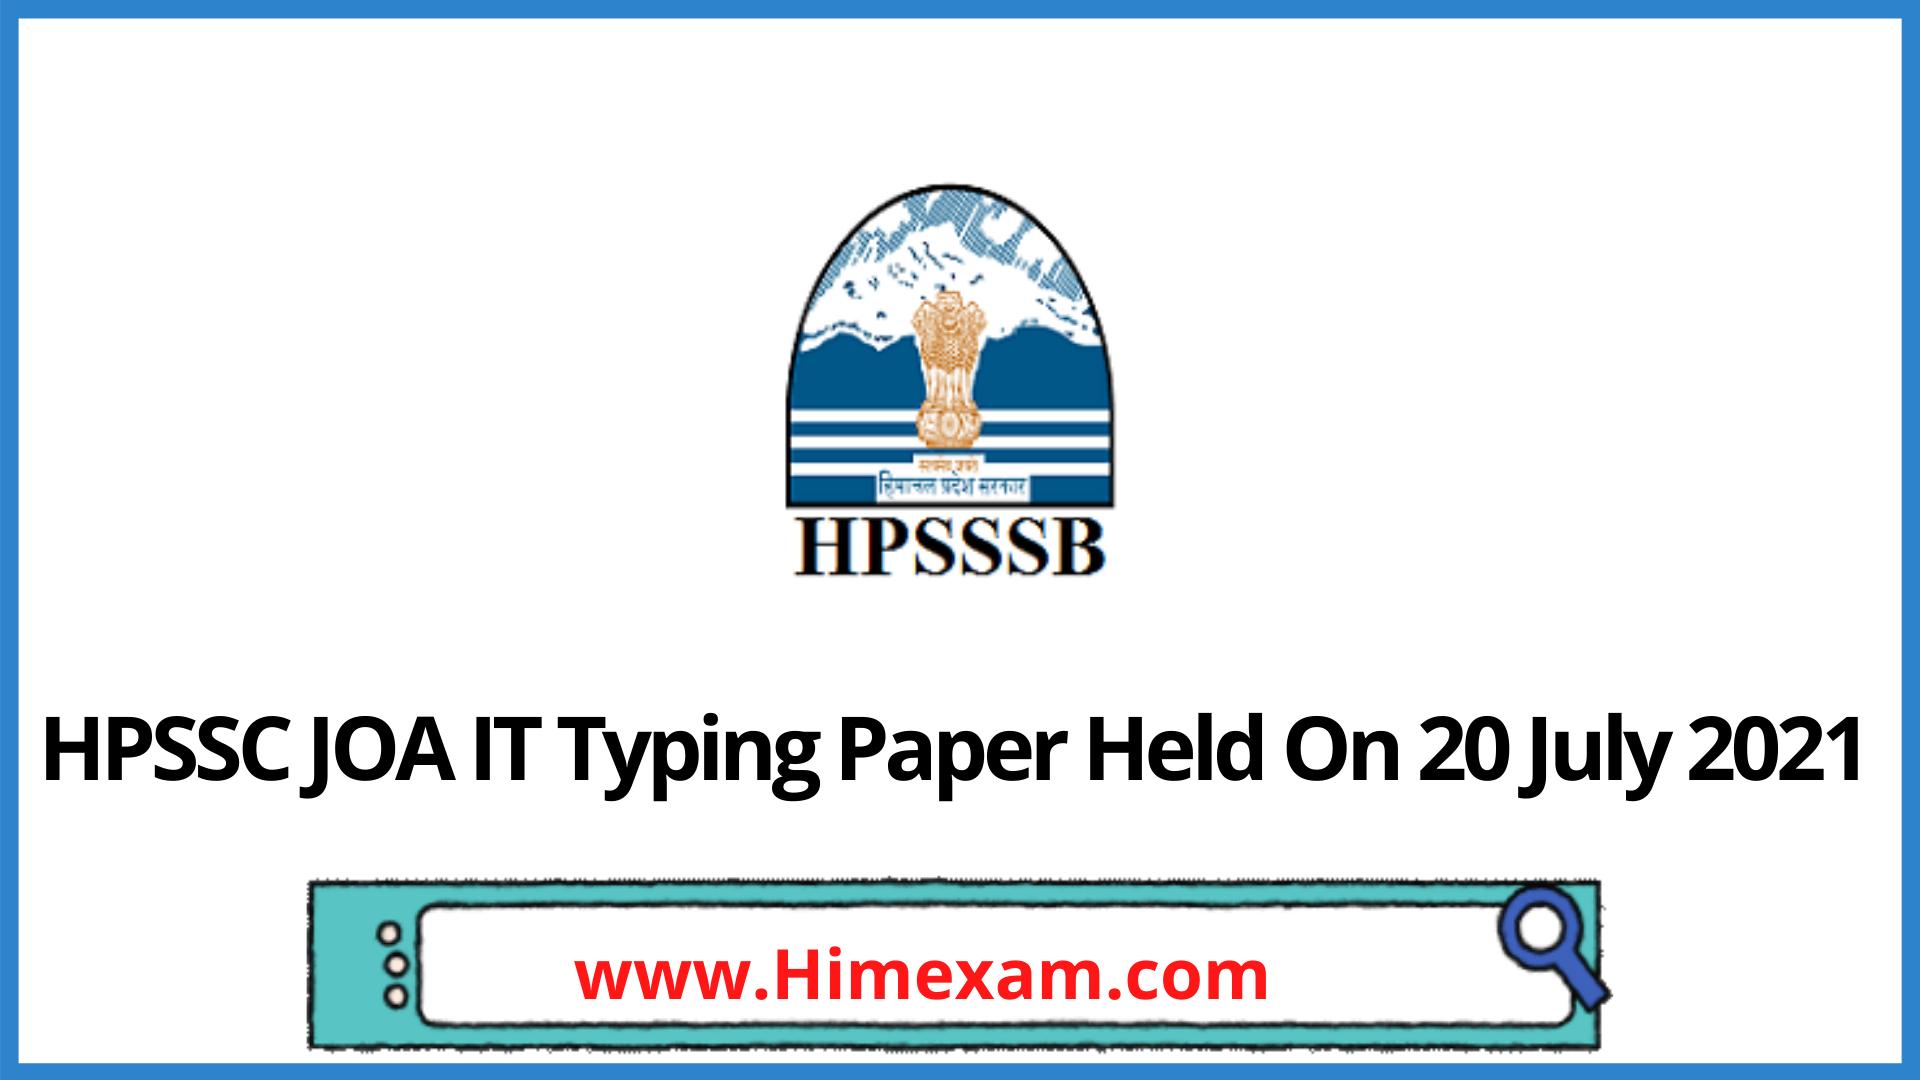 HPSSC JOA IT Typing Paper Held On 20 July 2021